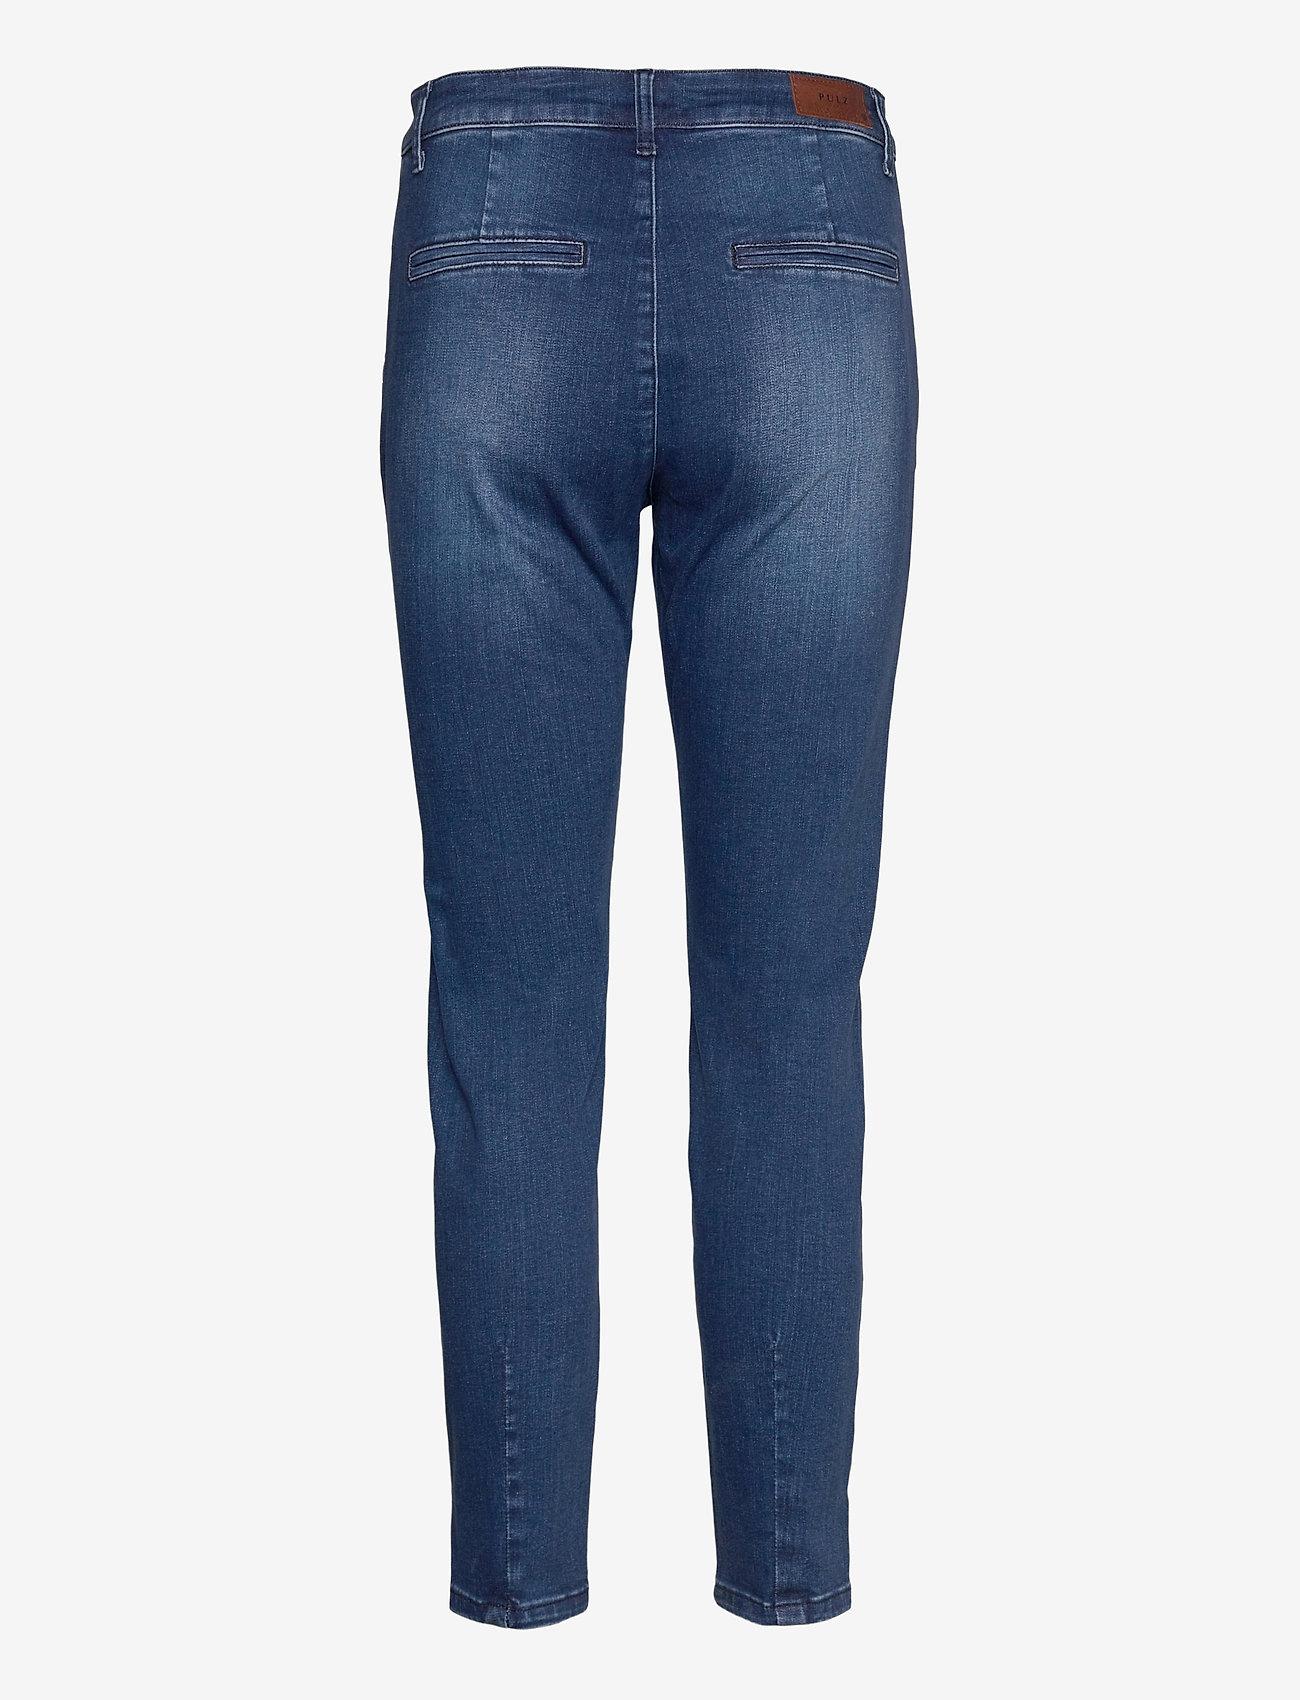 Pulz Jeans - PZCLARA Jeans - slim jeans - dark blue denim - 1